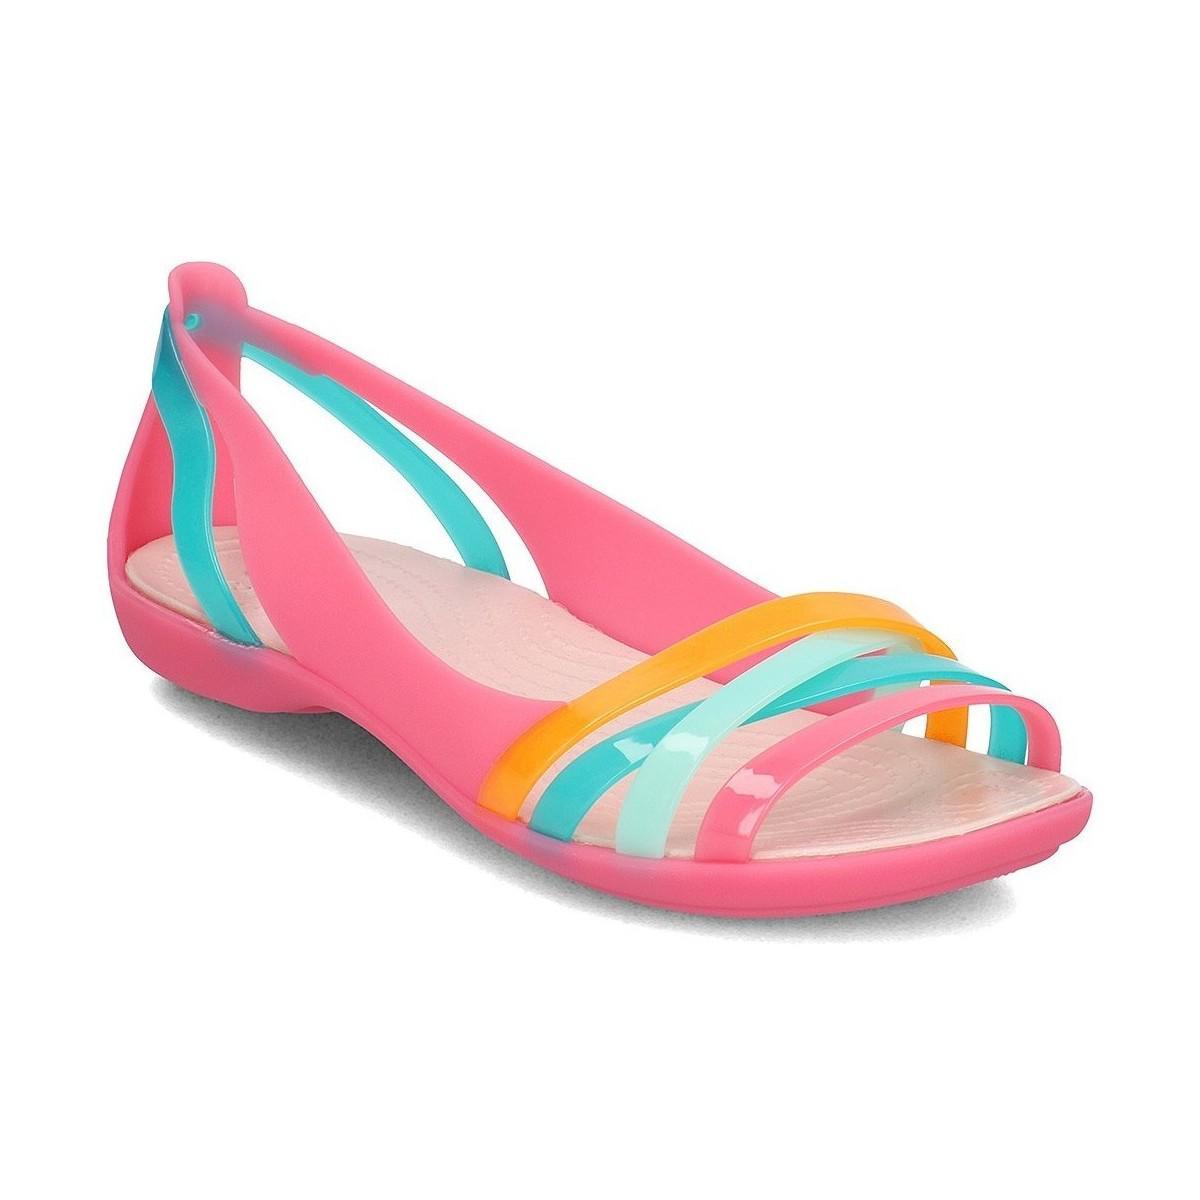 d31cd67d9 Crocs™ Isabella Huarache 2 Women s Sandals In Pink in Pink - Lyst